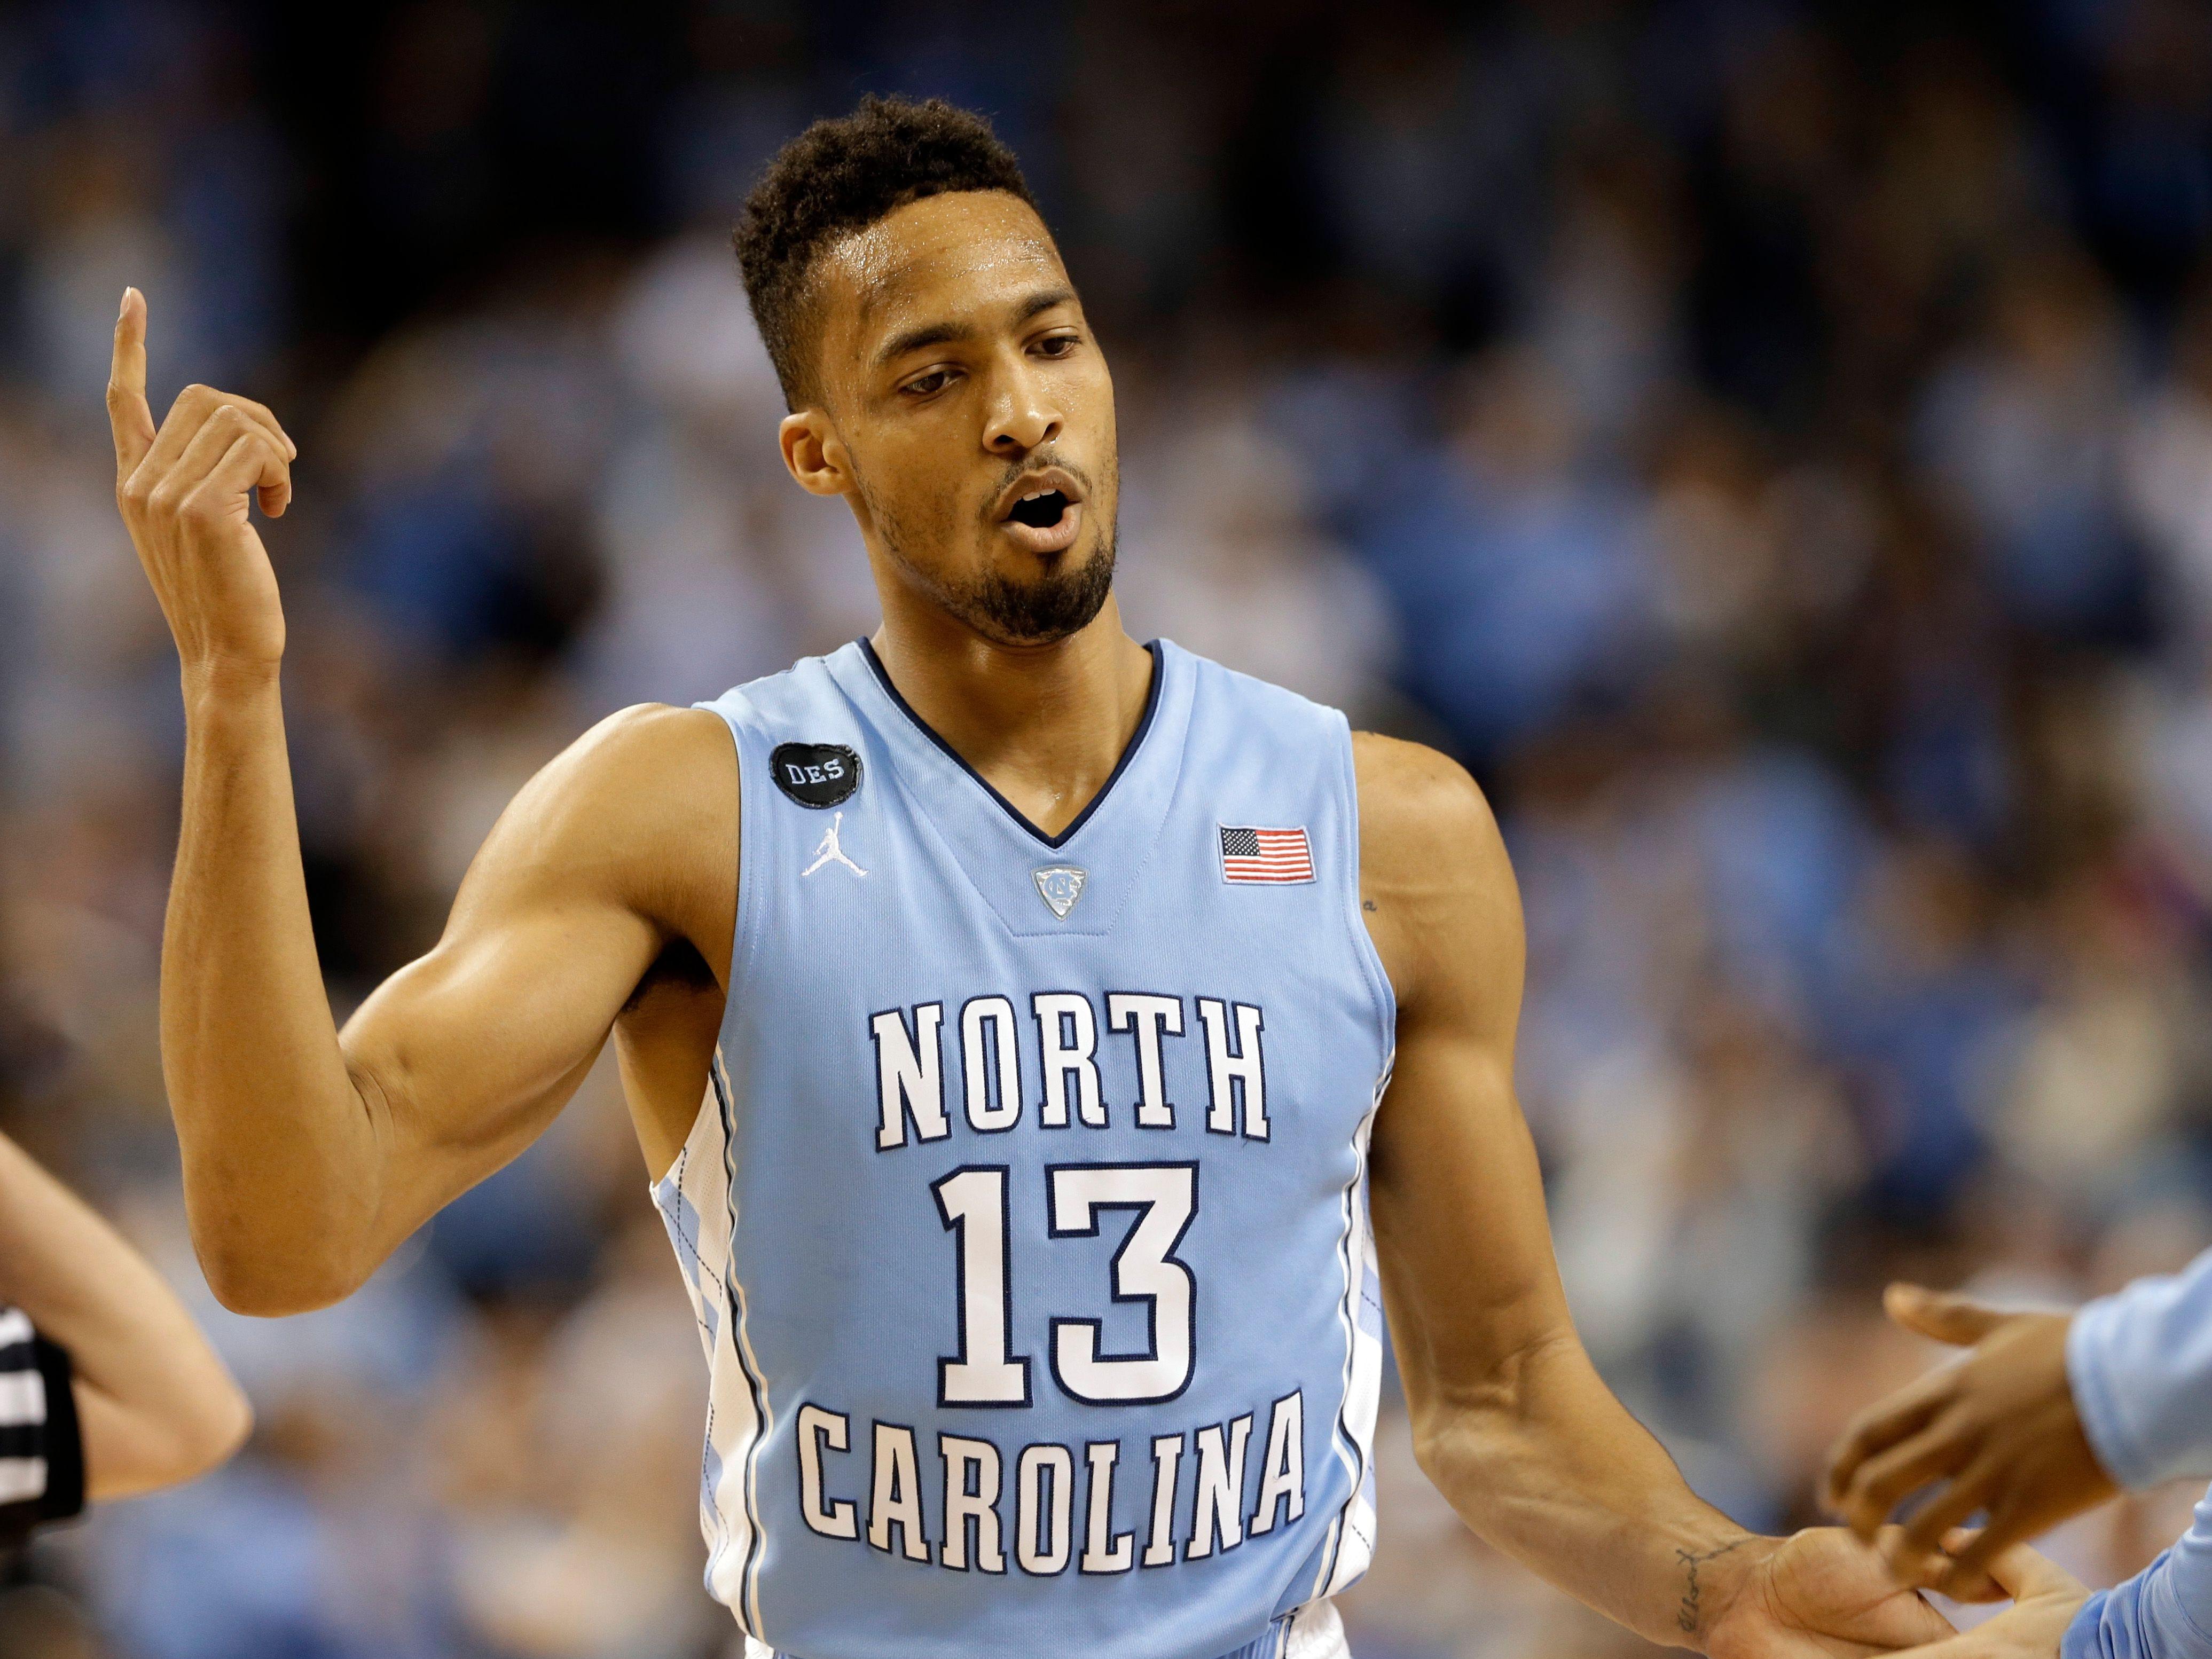 J.P. Tokoto, a 2012 Menomonee Falls graduate, played in seven NCAA Tournament games during his three years at North Carolina.